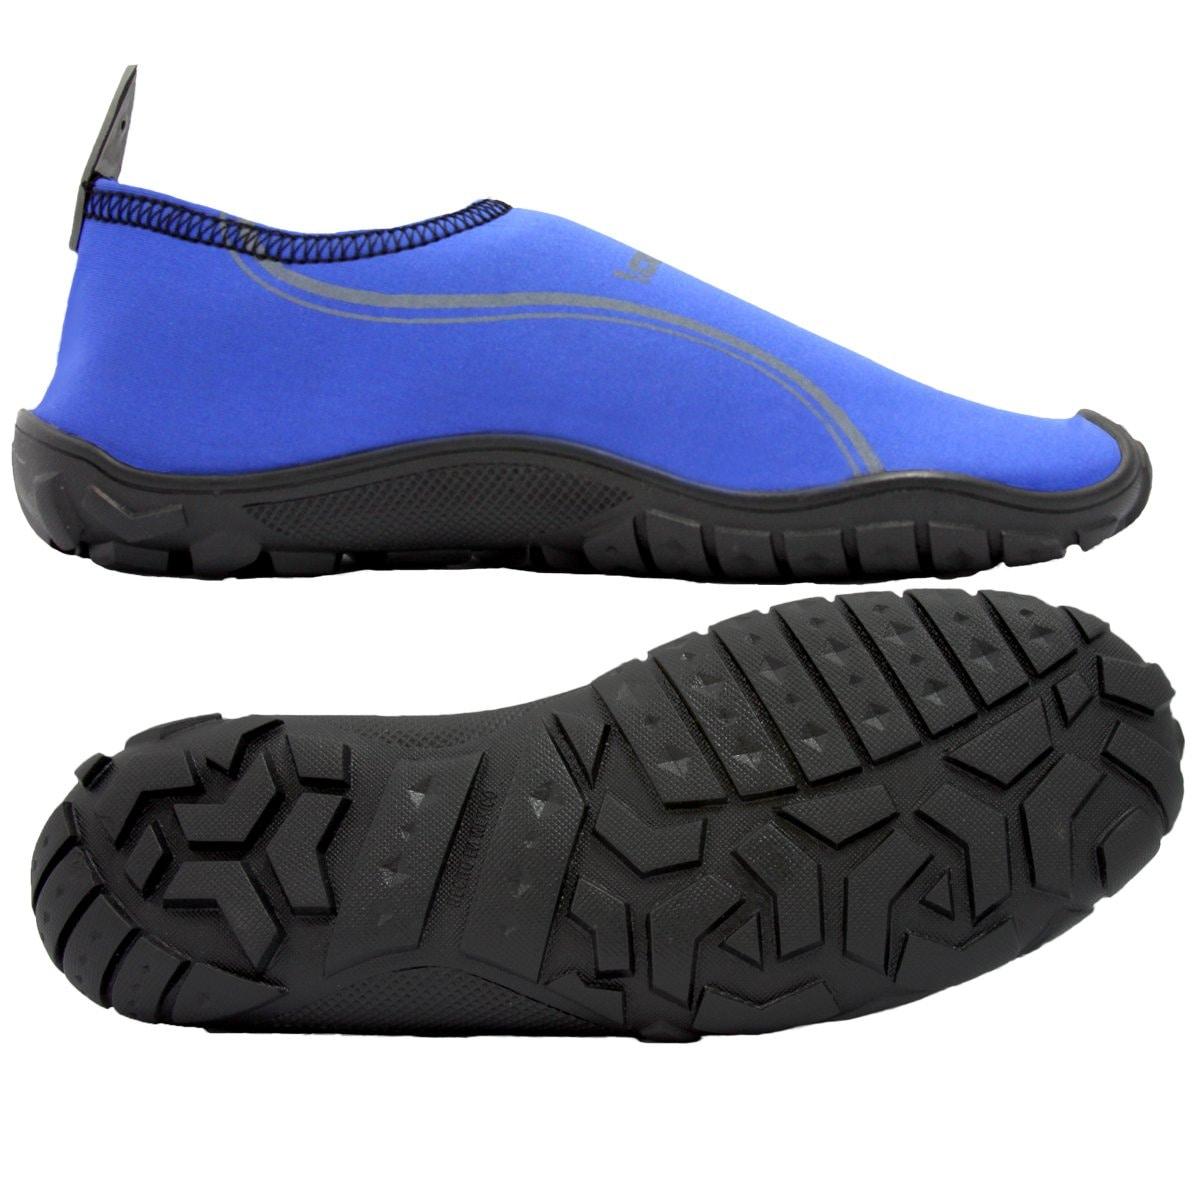 Zapato Acuático Aqua Rey Svago - Infantil